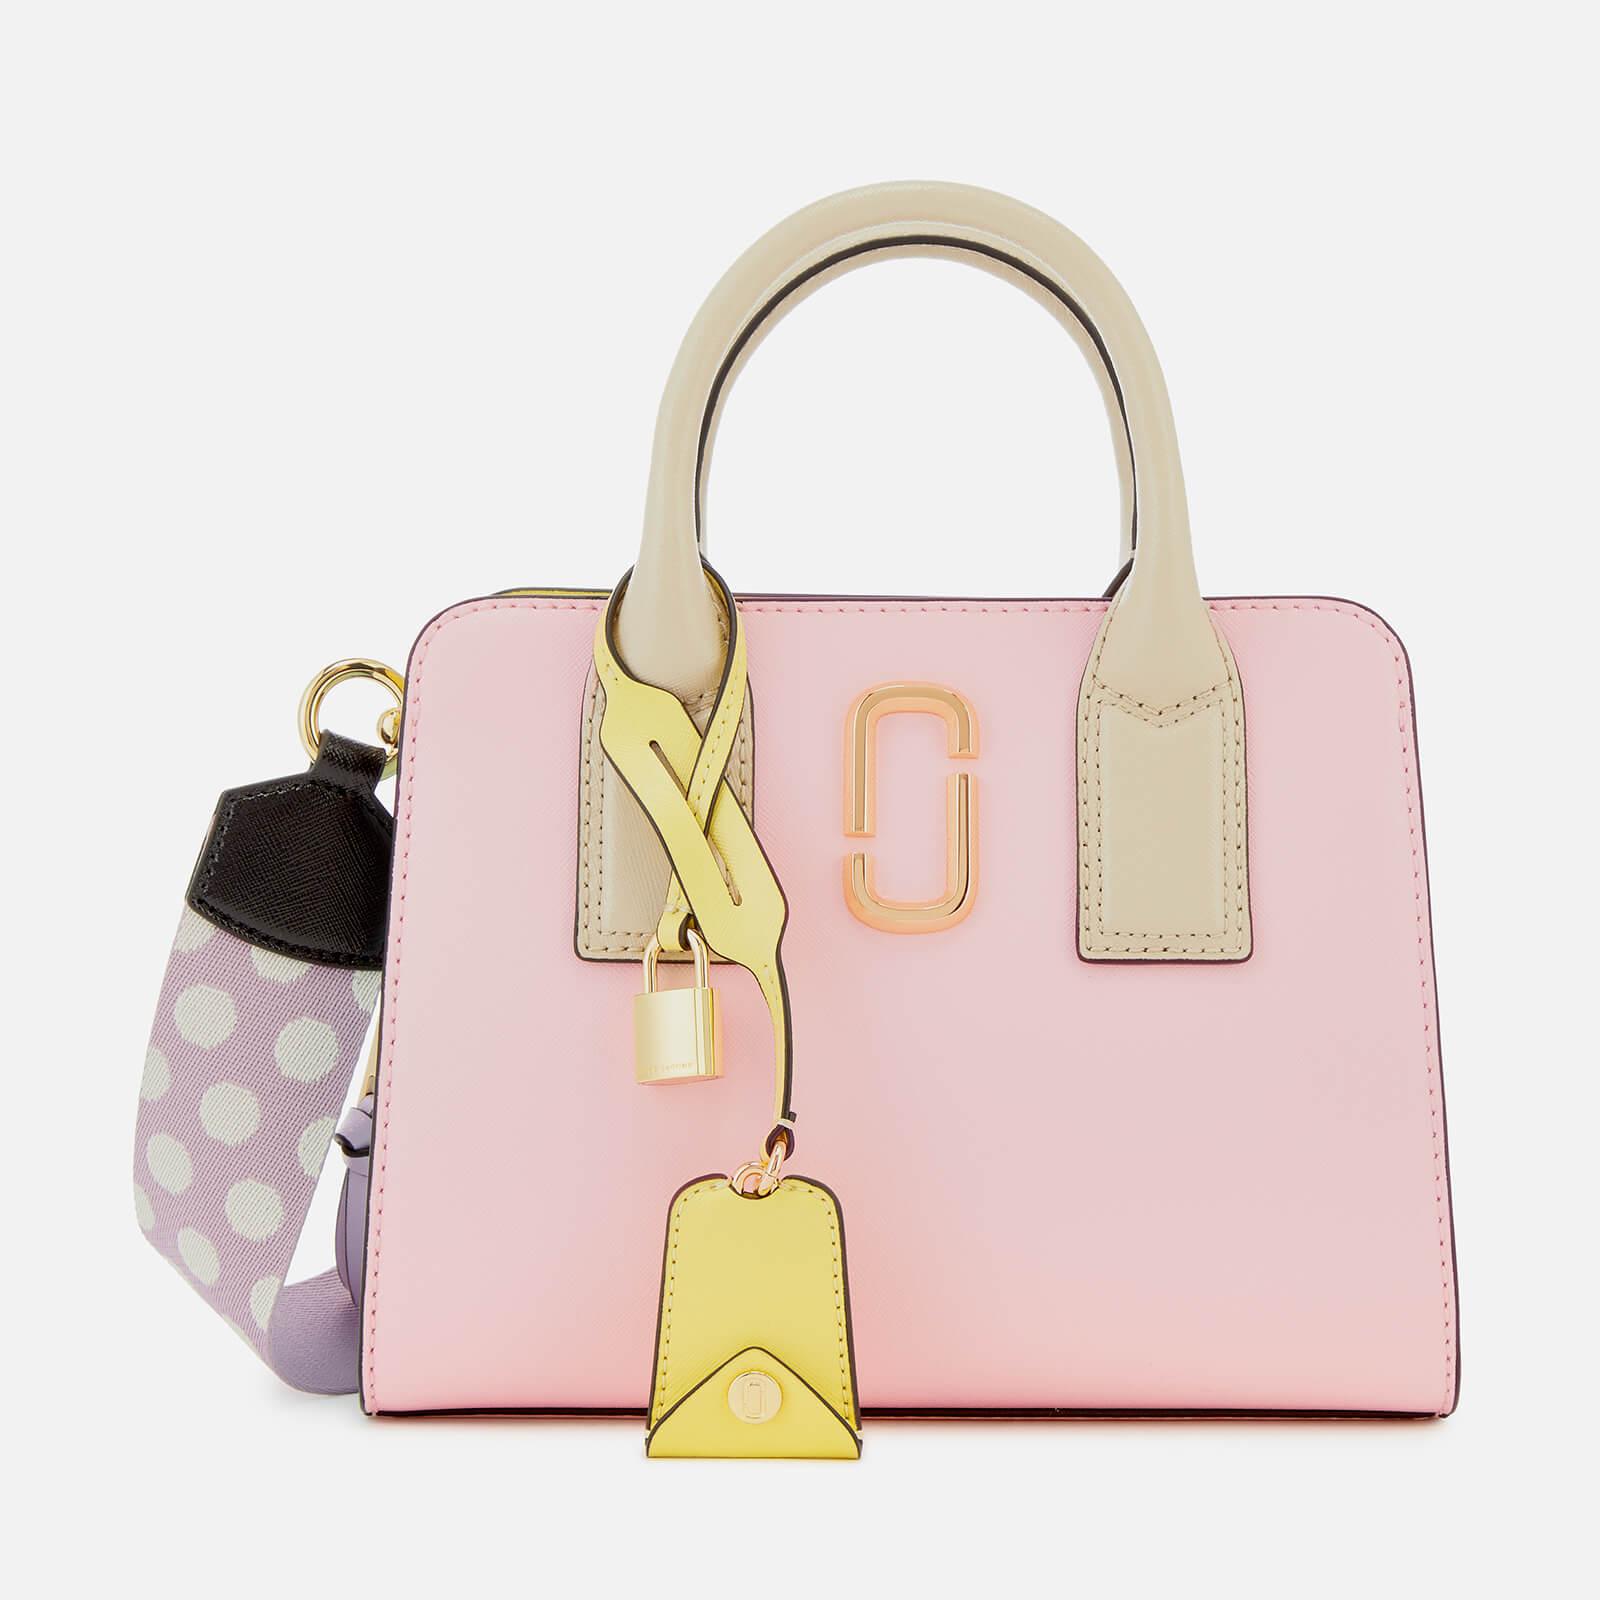 0de35a2442d Marc Jacobs Women's Little Big Shot Tote Bag - Blush Multi - Free UK  Delivery over £50